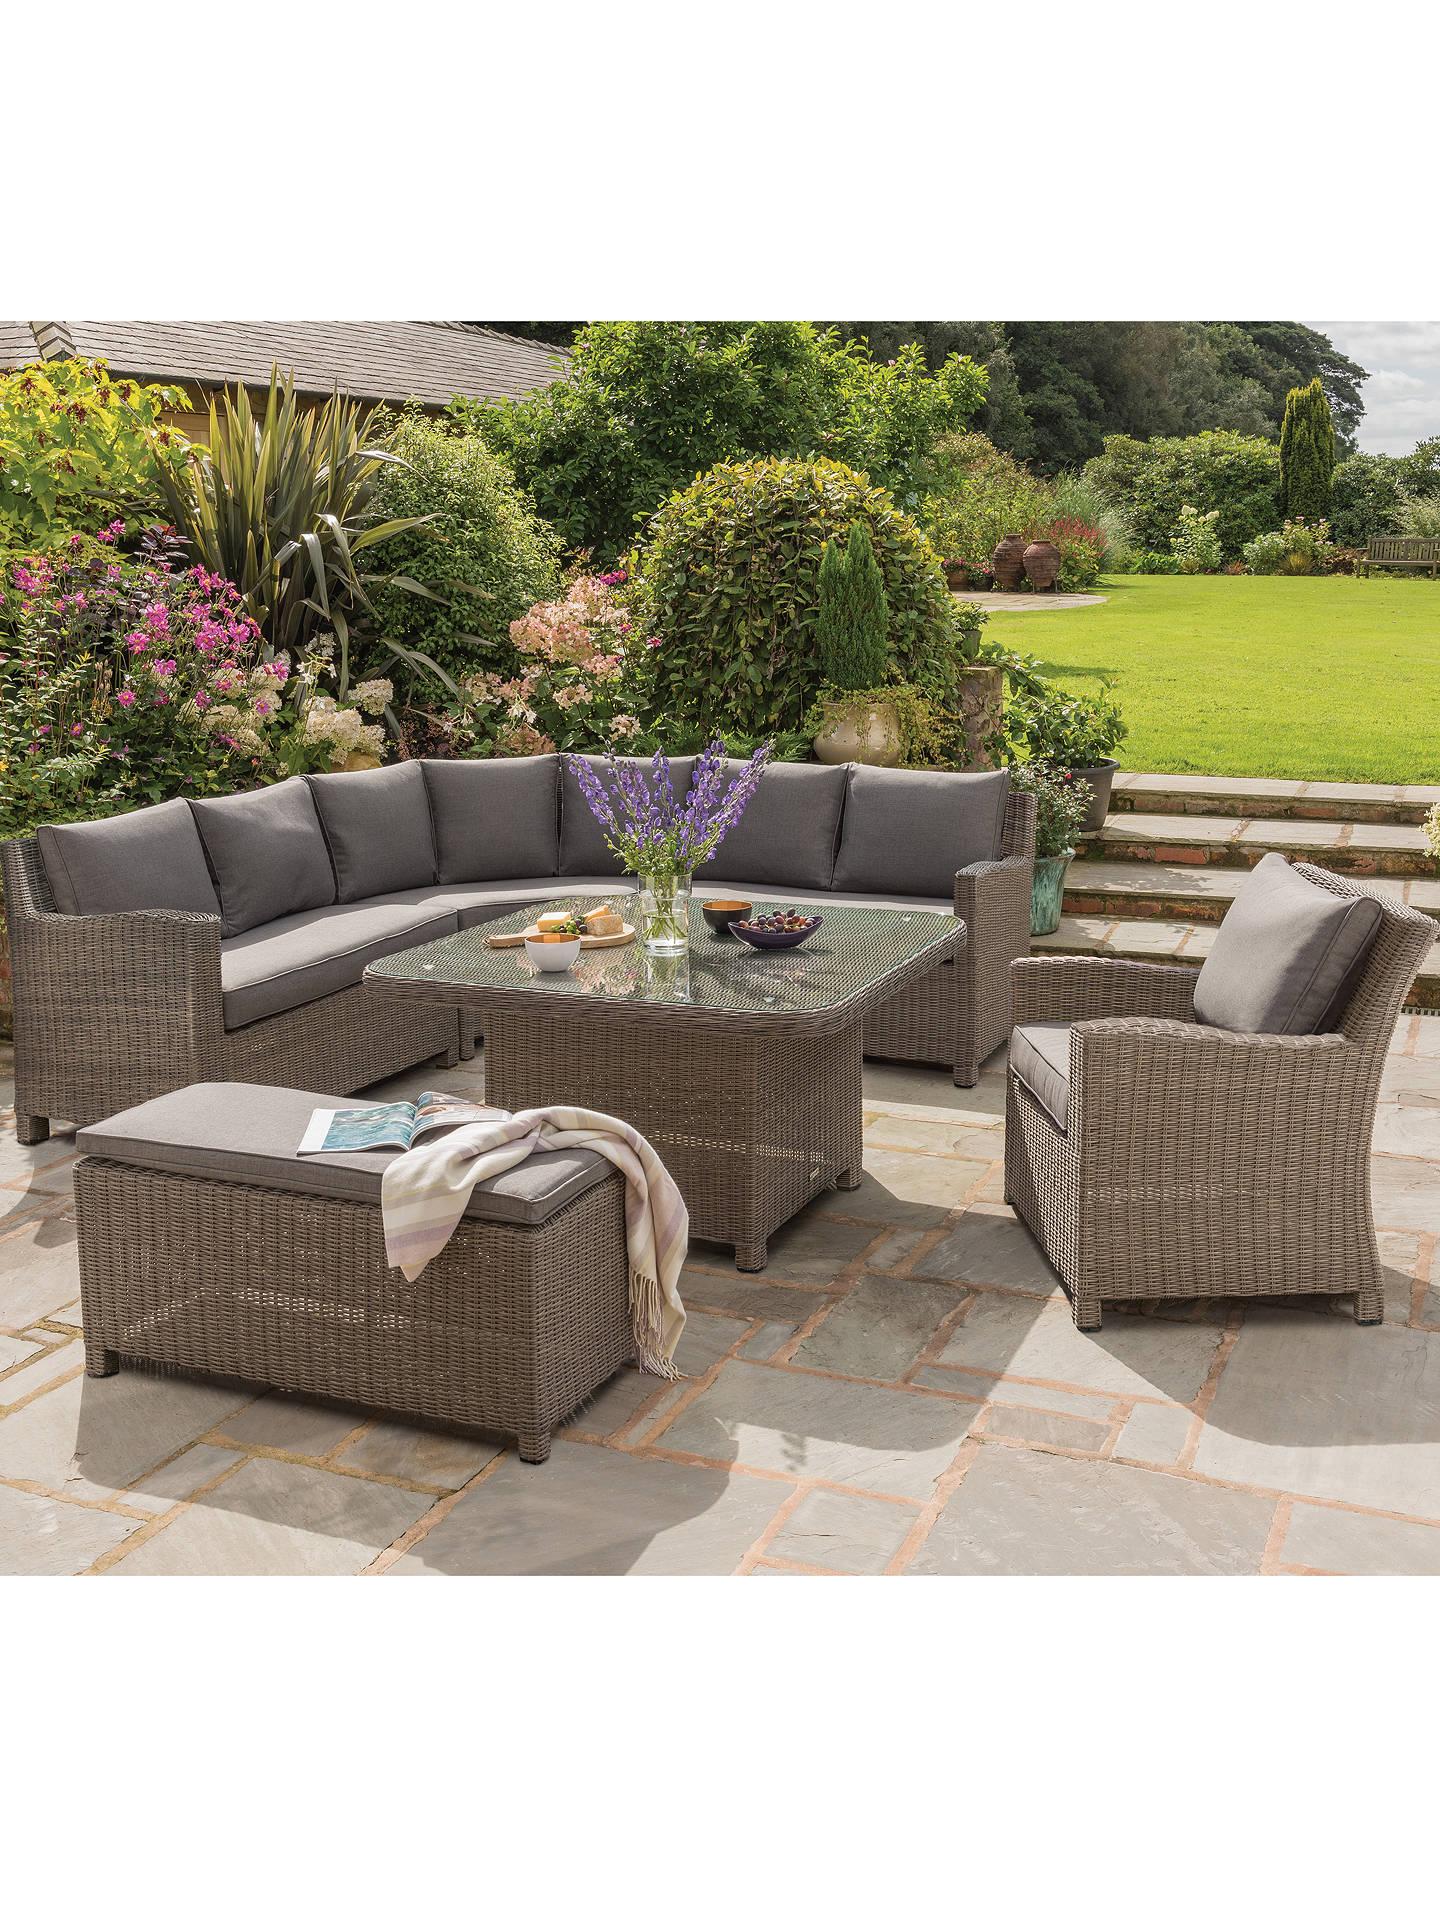 KETTLER Palma Grande 6-Seat Garden Corner Sofa and Table Set, Rattan